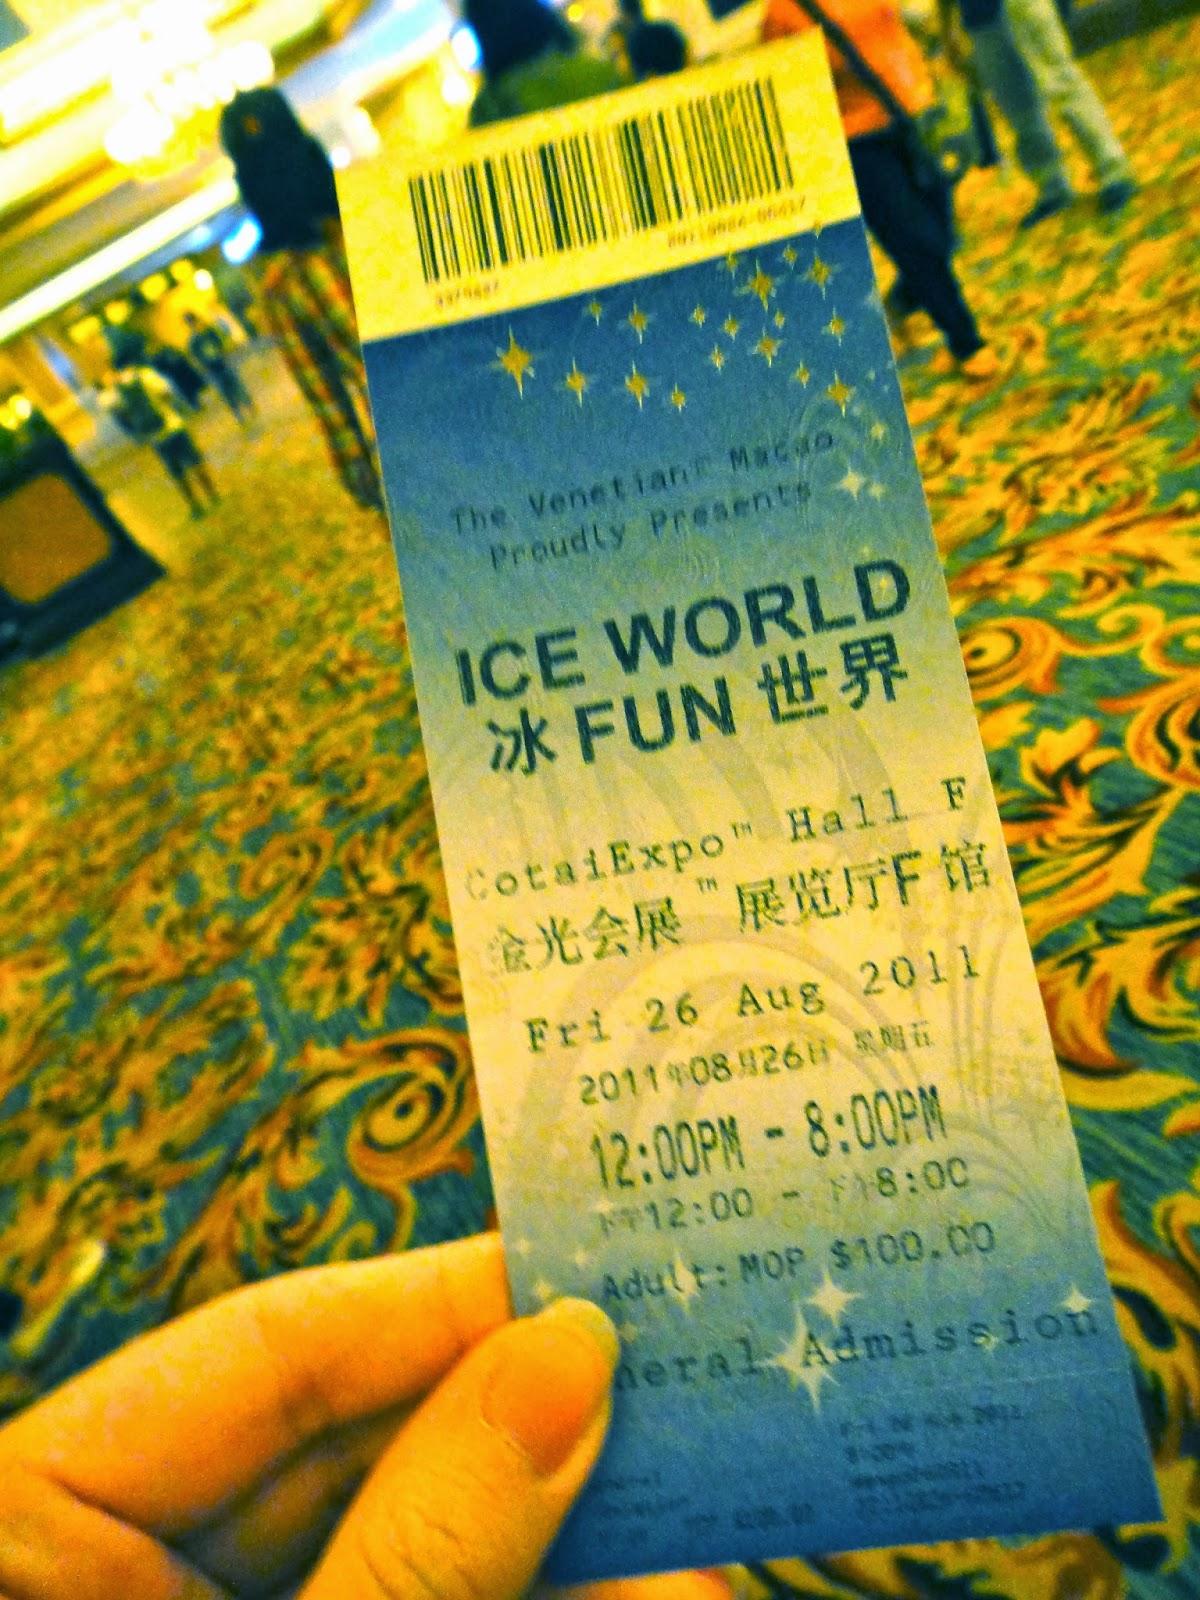 Ice World Exhibition The Venetian Macao Ticket